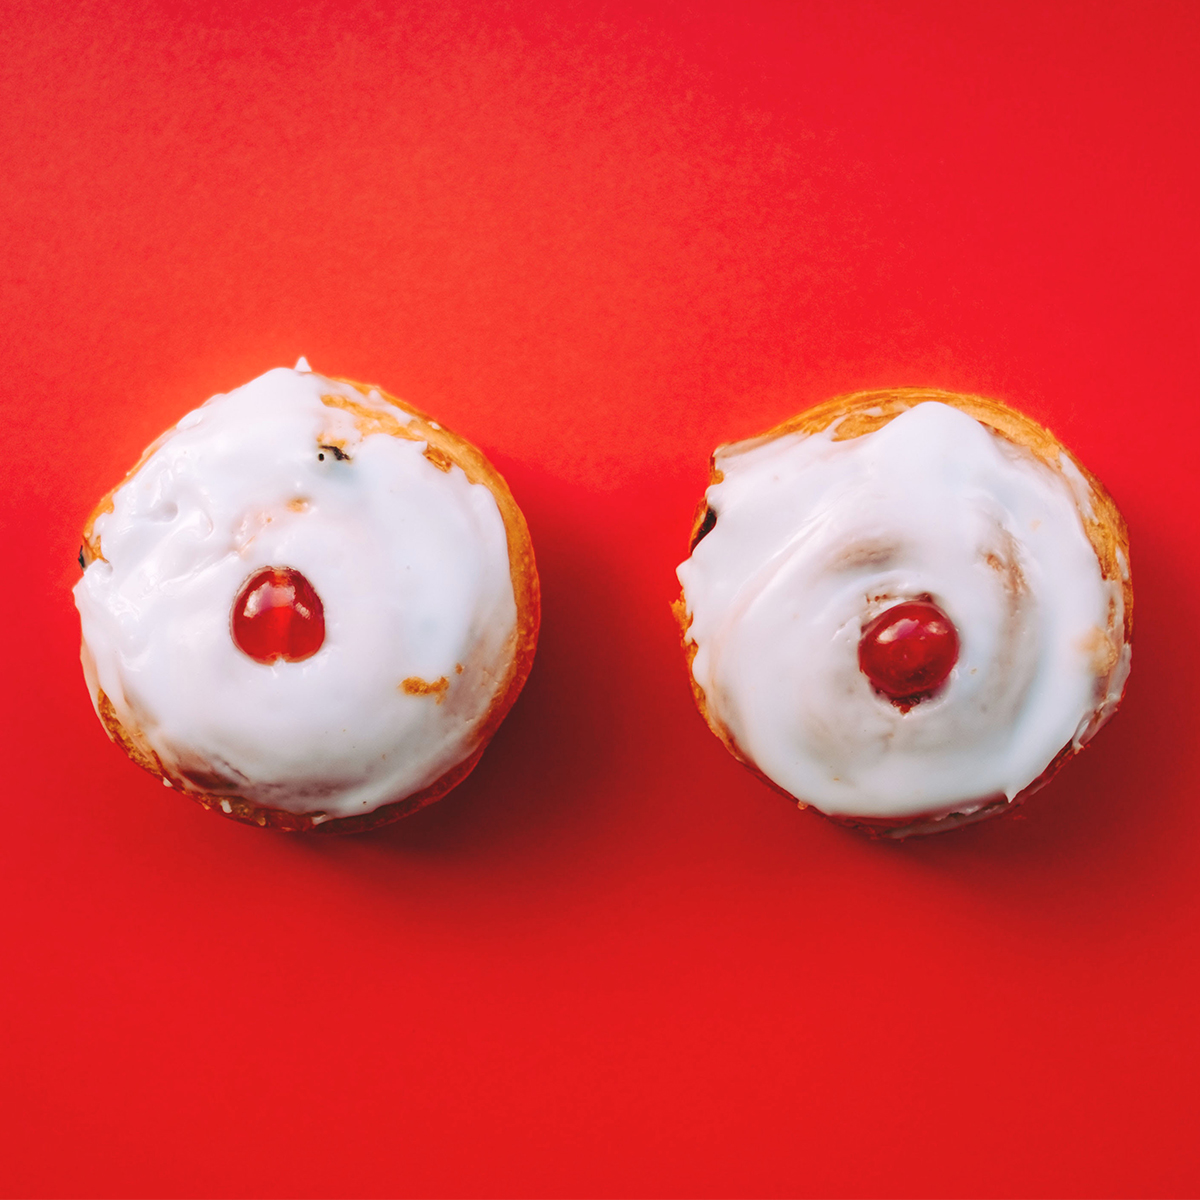 + Lanolin, aka nipple cream - Yet another gift I never considered! Silvia explained,